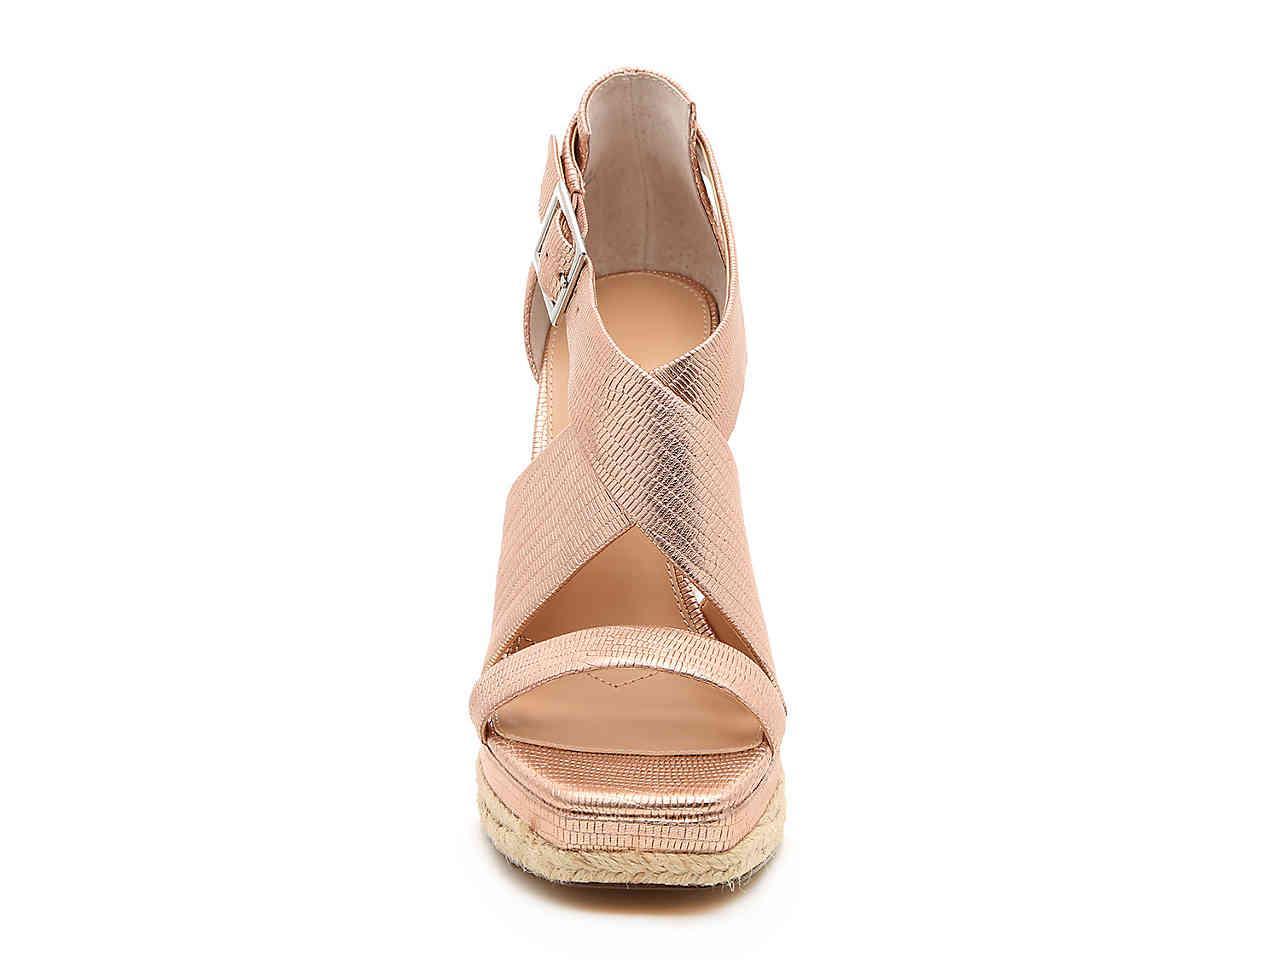 1e266c61652 Charles David Esper Espadrille Wedge Sandal in Metallic - Lyst